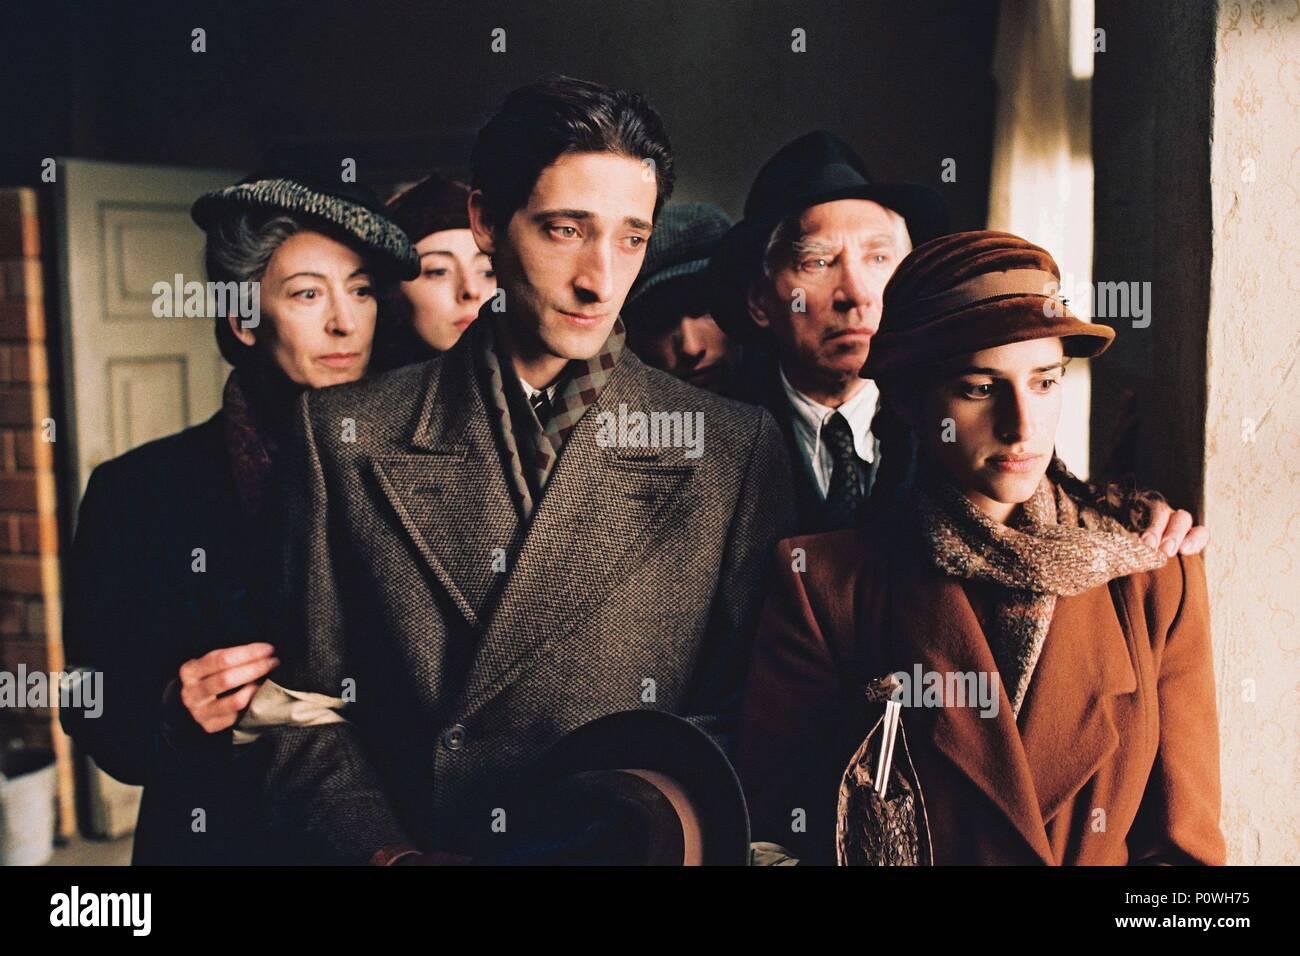 Original Film Title: THE PIANIST.  English Title: THE PIANIST.  Film Director: ROMAN POLANSKI.  Year: 2002.  Stars: ADRIEN BRODY; FRANK FINLAY; MAUREEN LIPMAN; ED STOPPARD; JESSICA KATE MEYER; JULIA RAYNER. Credit: FOCUS FEATURES / Album - Stock Image